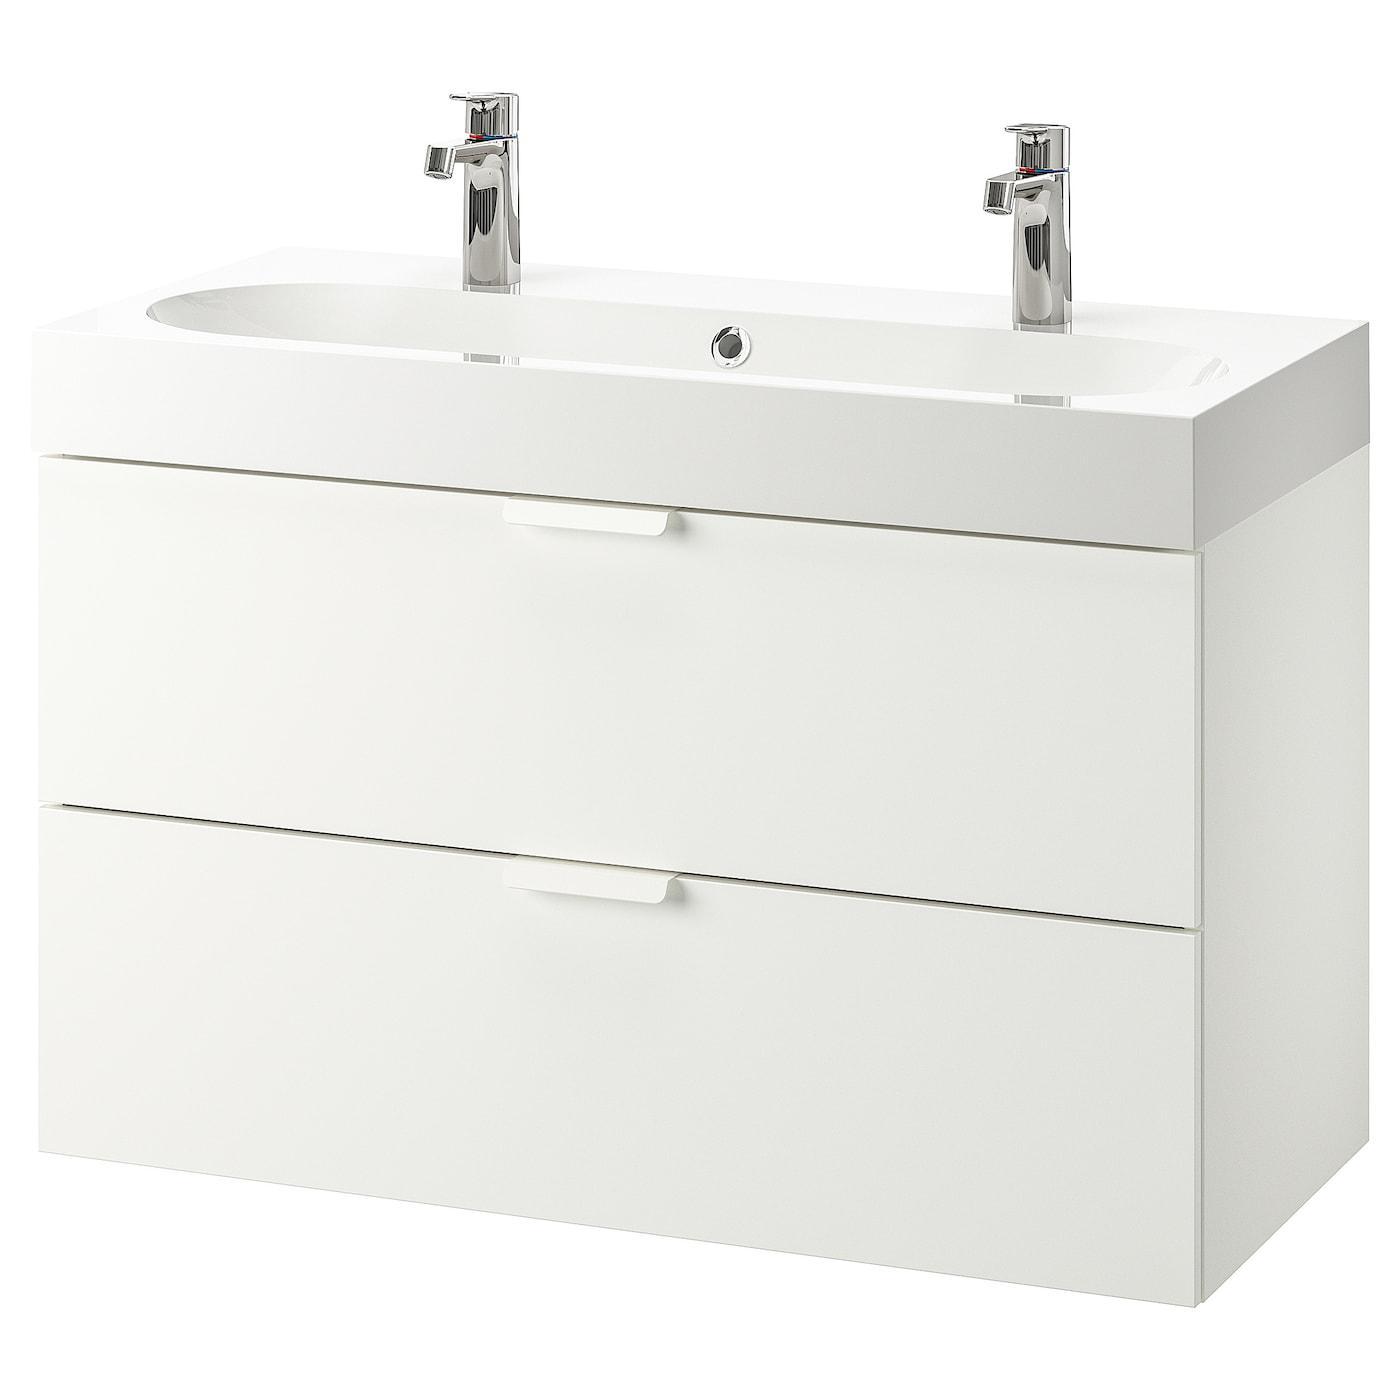 Ikea Waschbeckenunterschrank Godmorgon